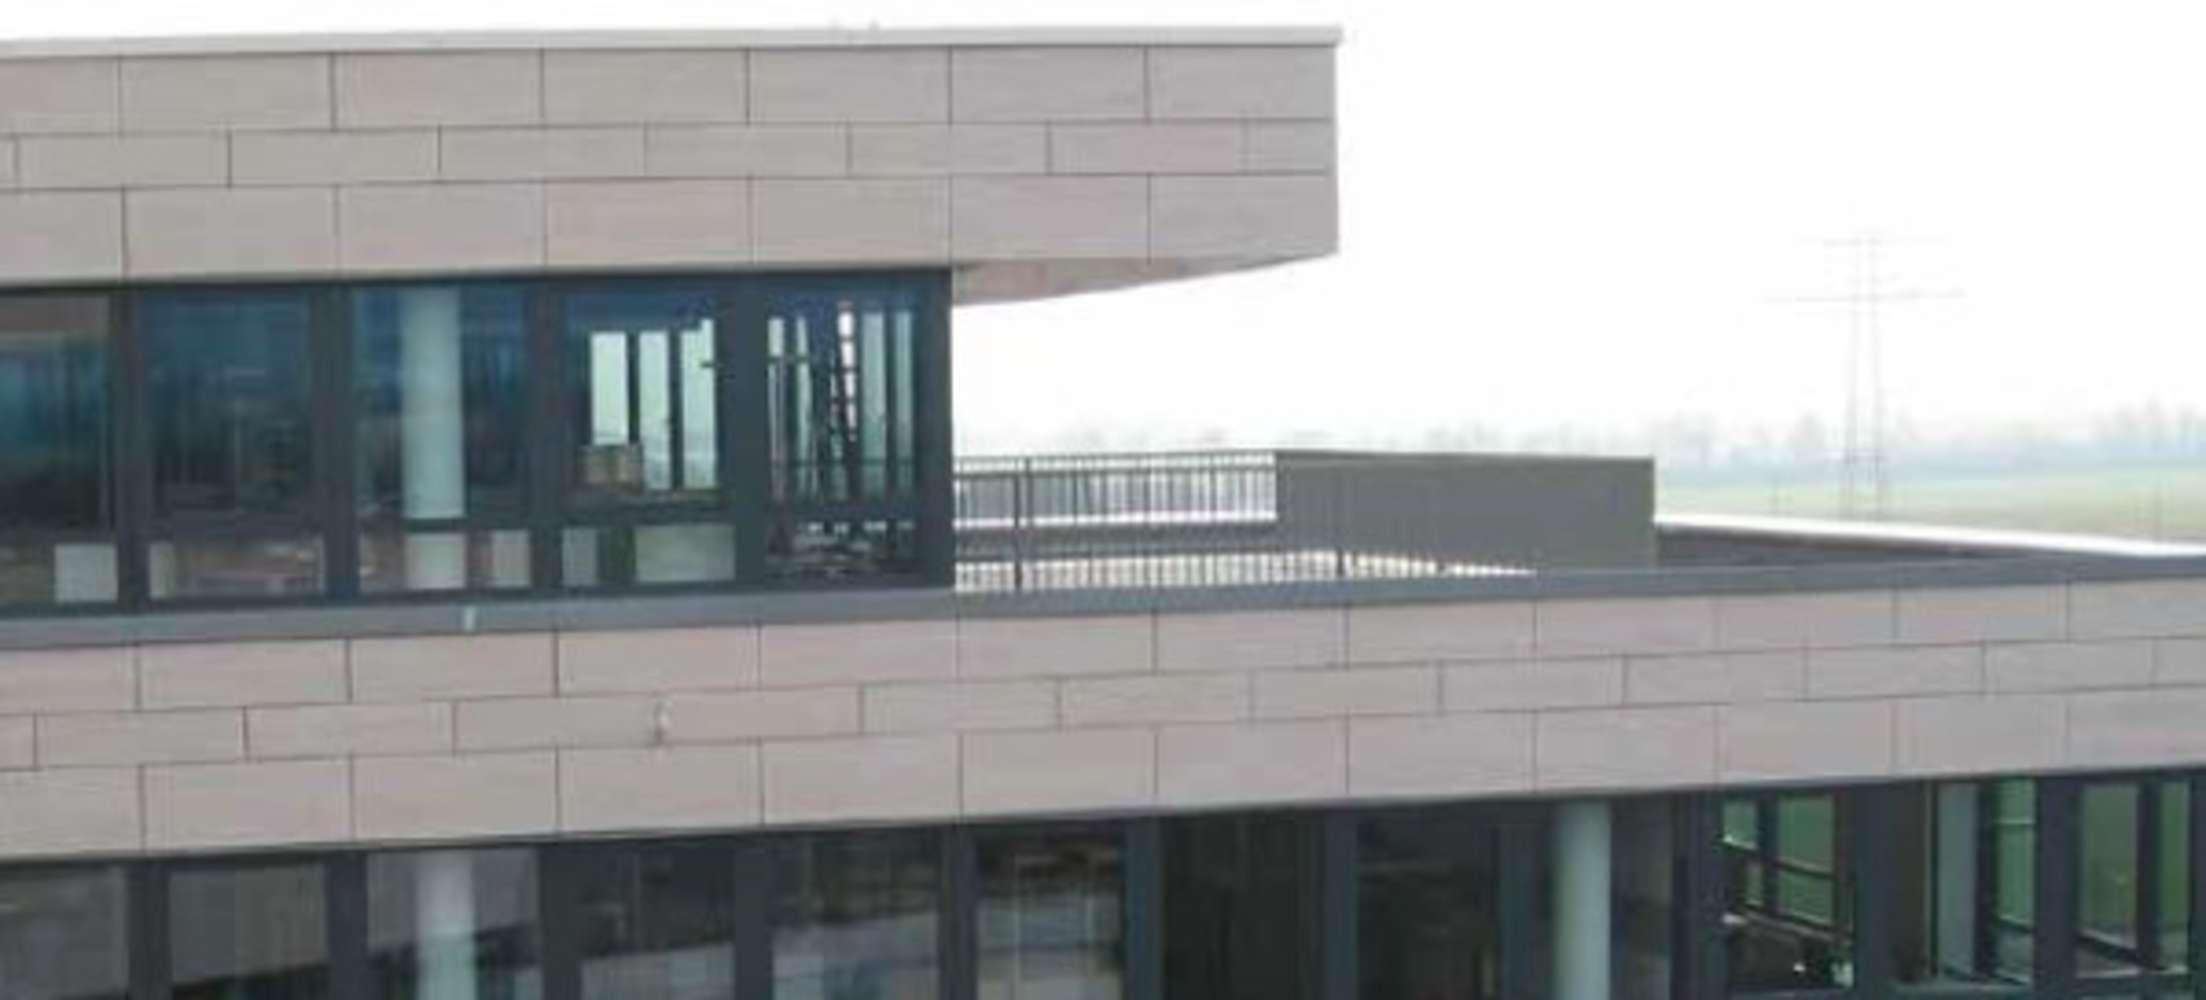 Büros Bad homburg, 61352 - Büro - Bad Homburg - F1859 - 9917275